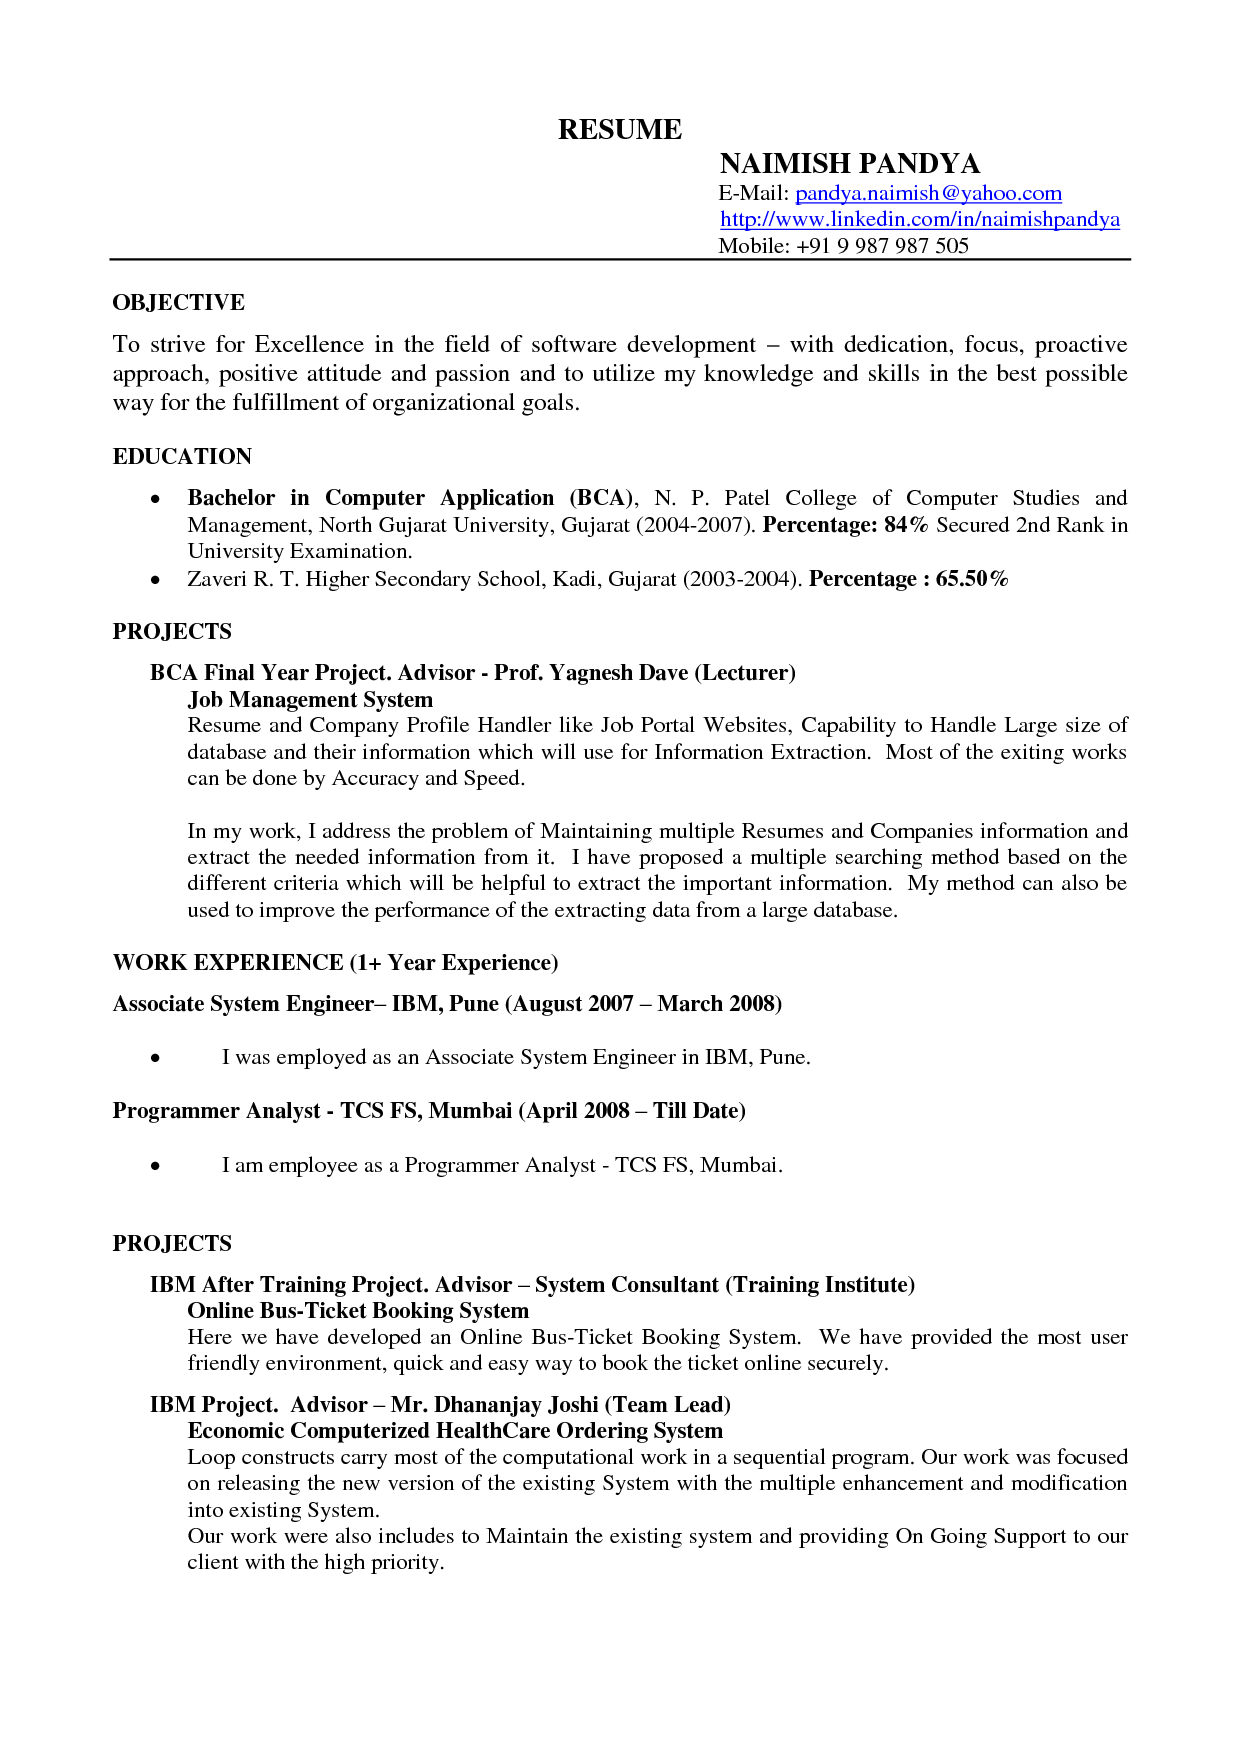 Google Resume Examples | berathen.Com